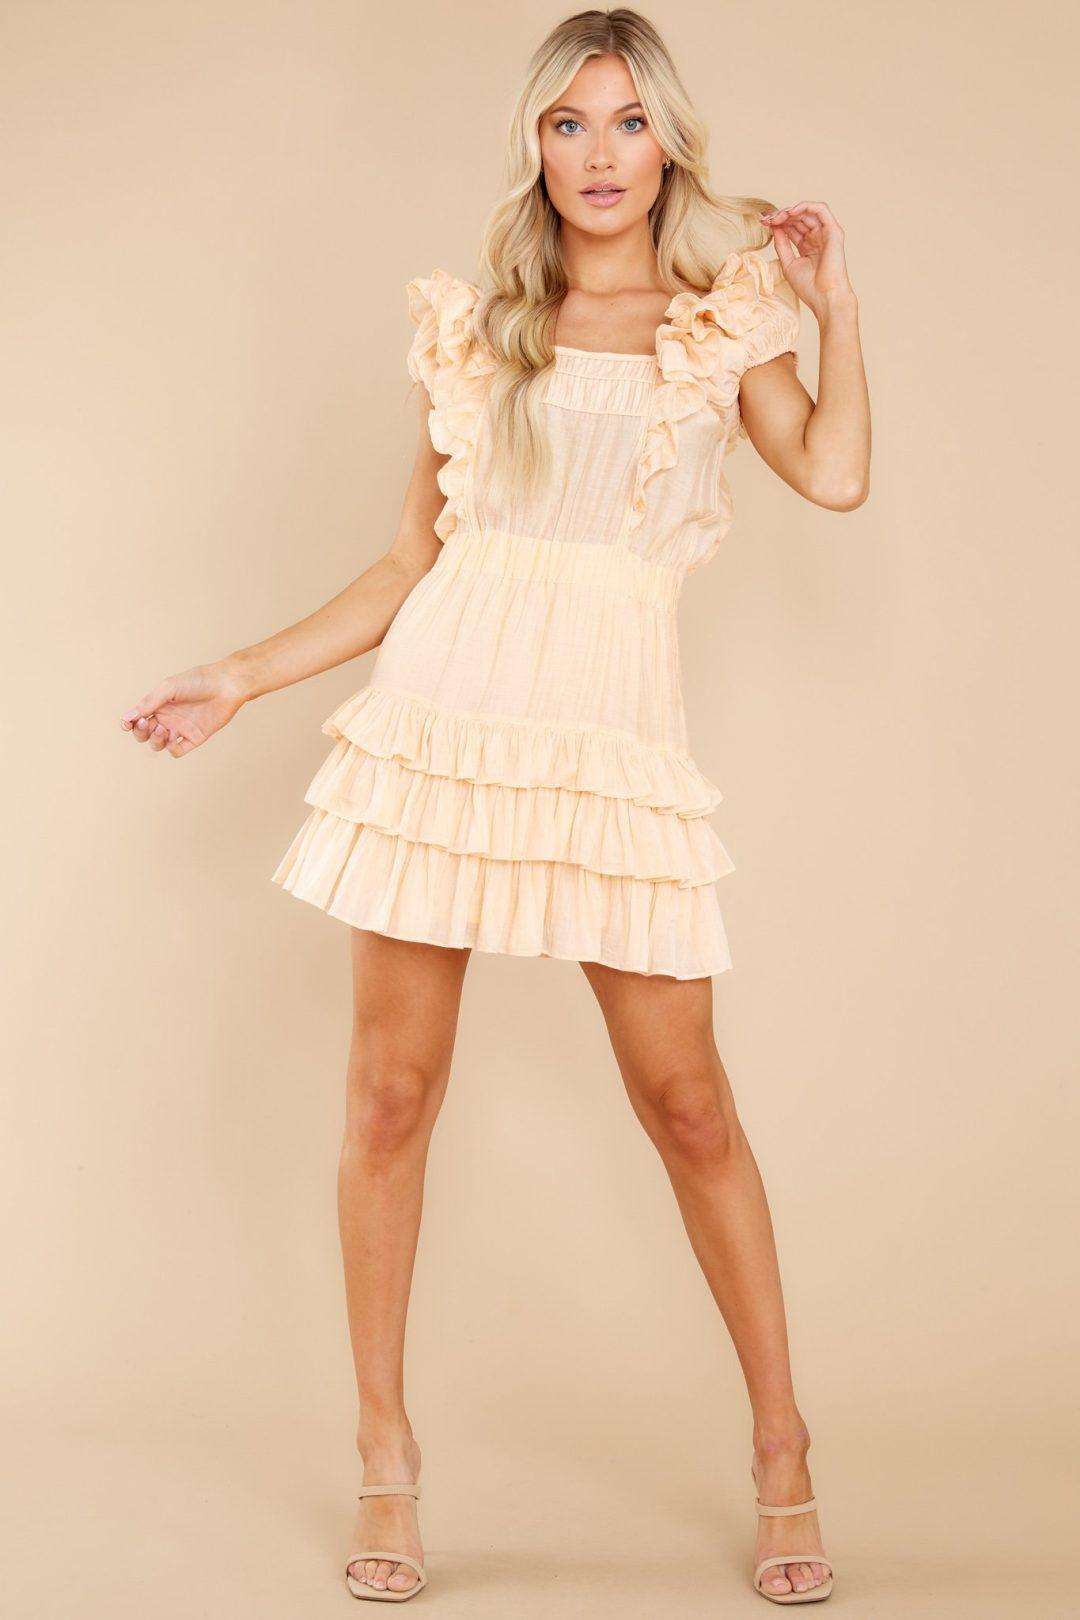 Light peach summer mini dress with ruffles